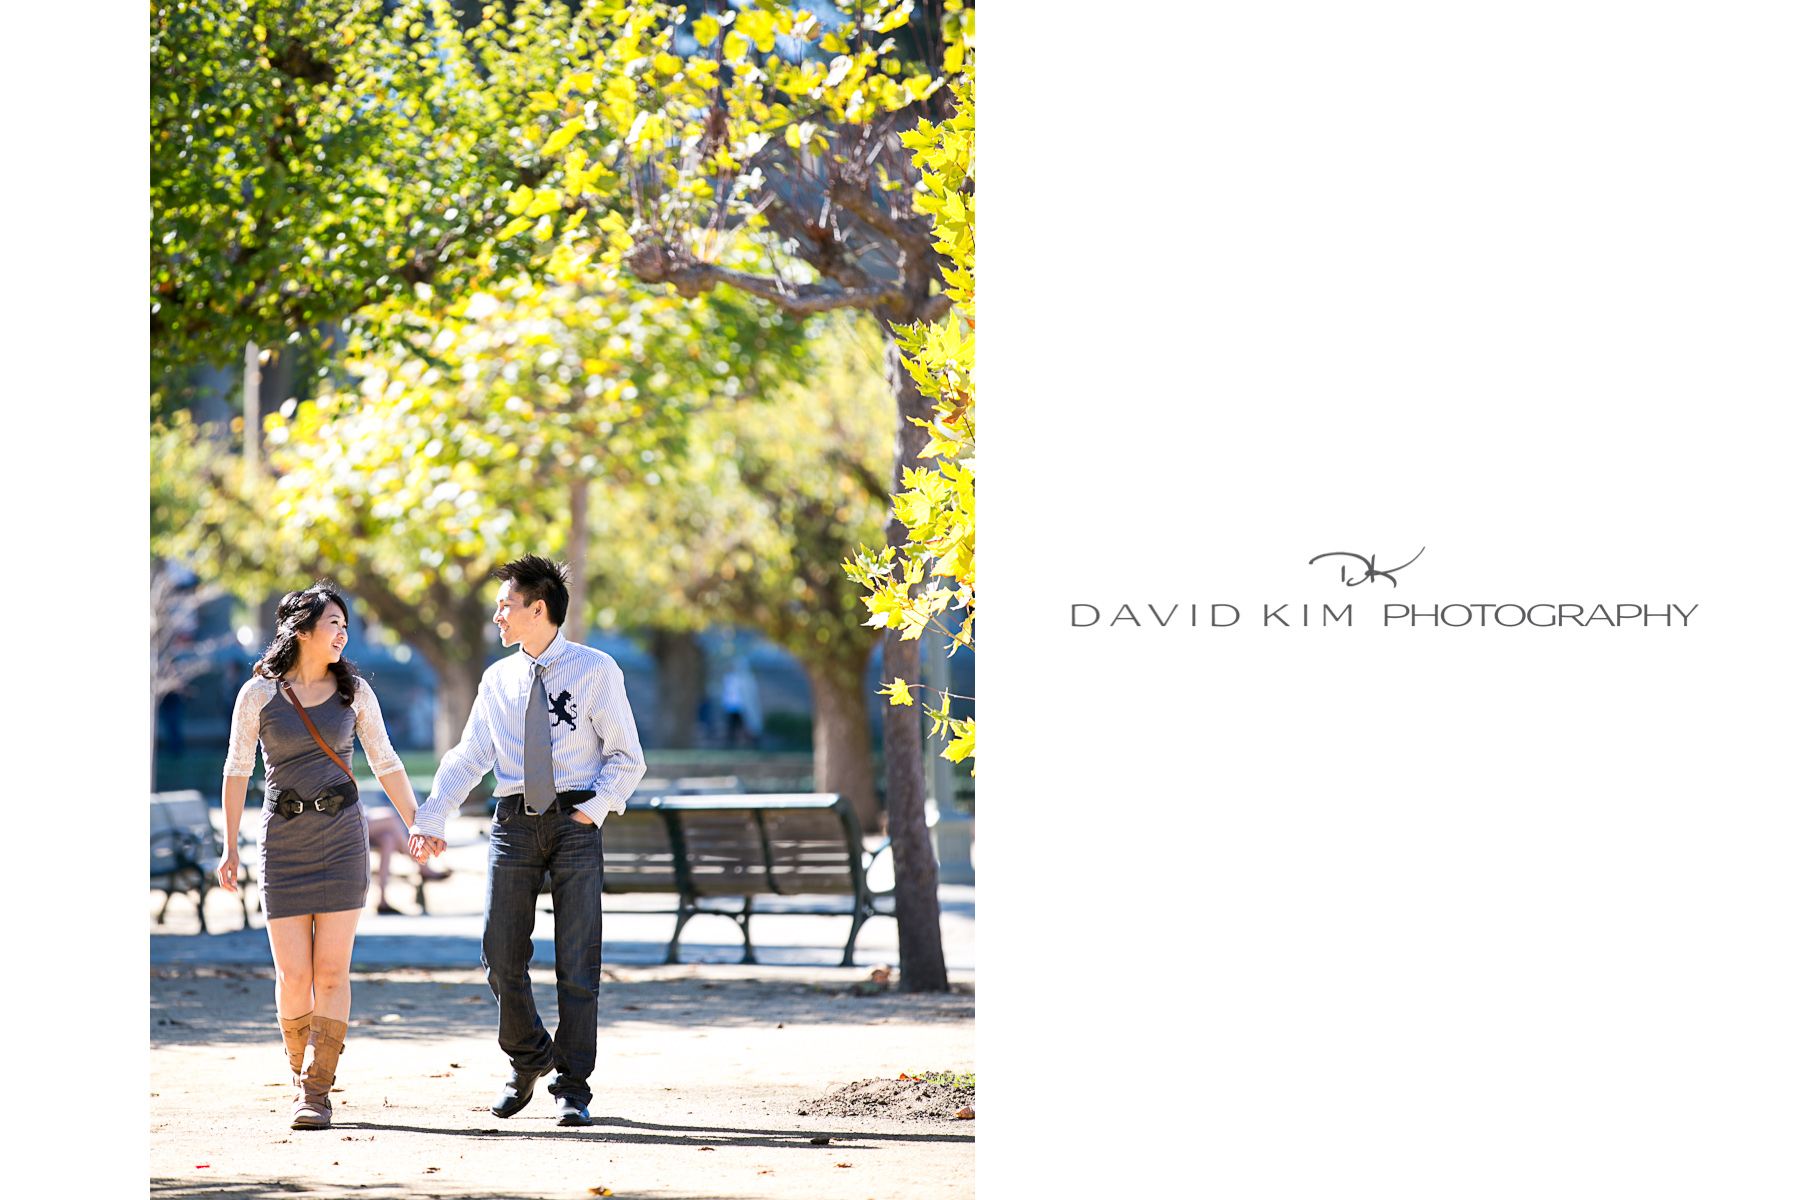 Nina-Hong-007-6-golden-gate-park-engagement-.jpg